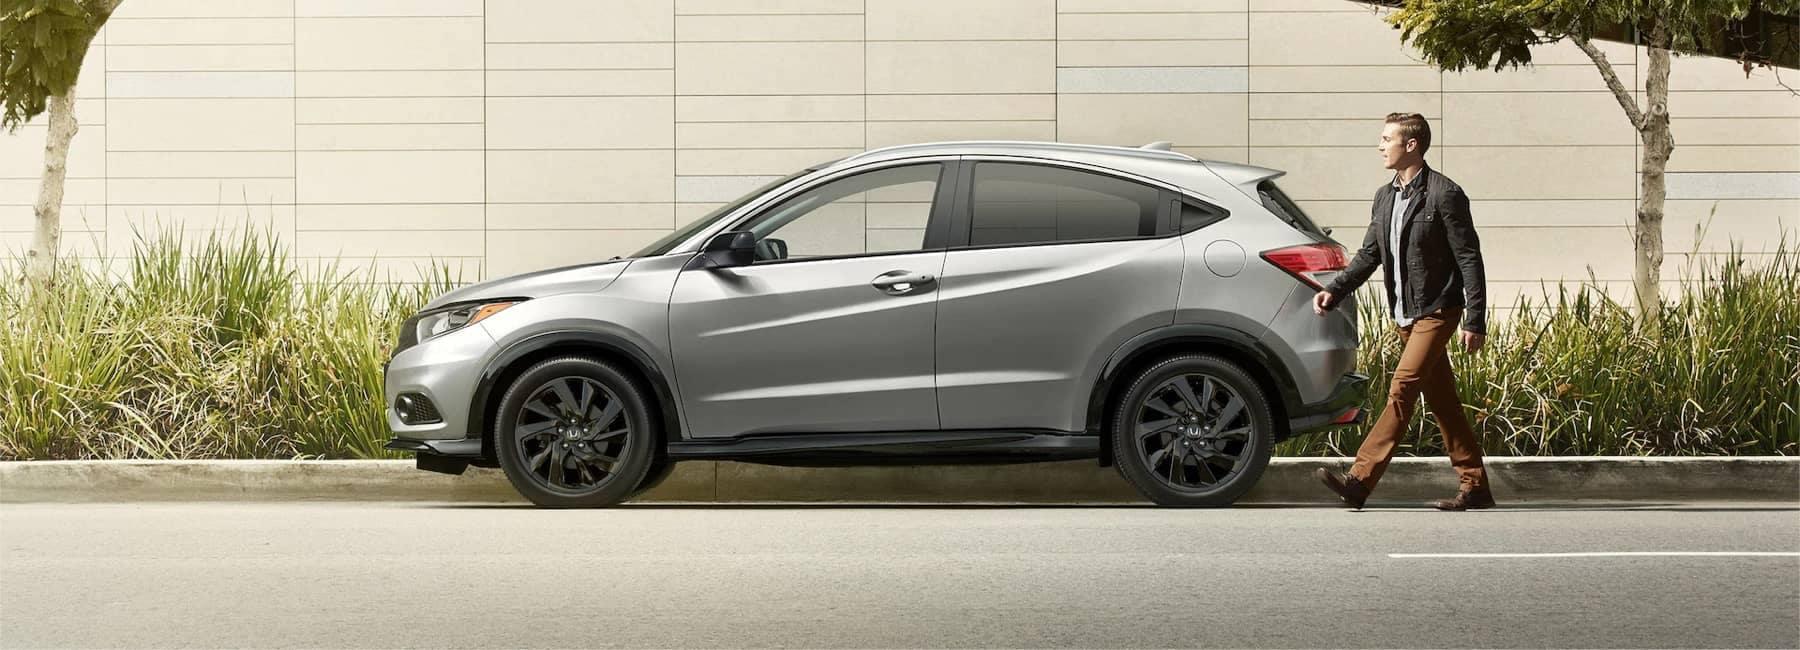 2021 Honda HRV parked on side of road